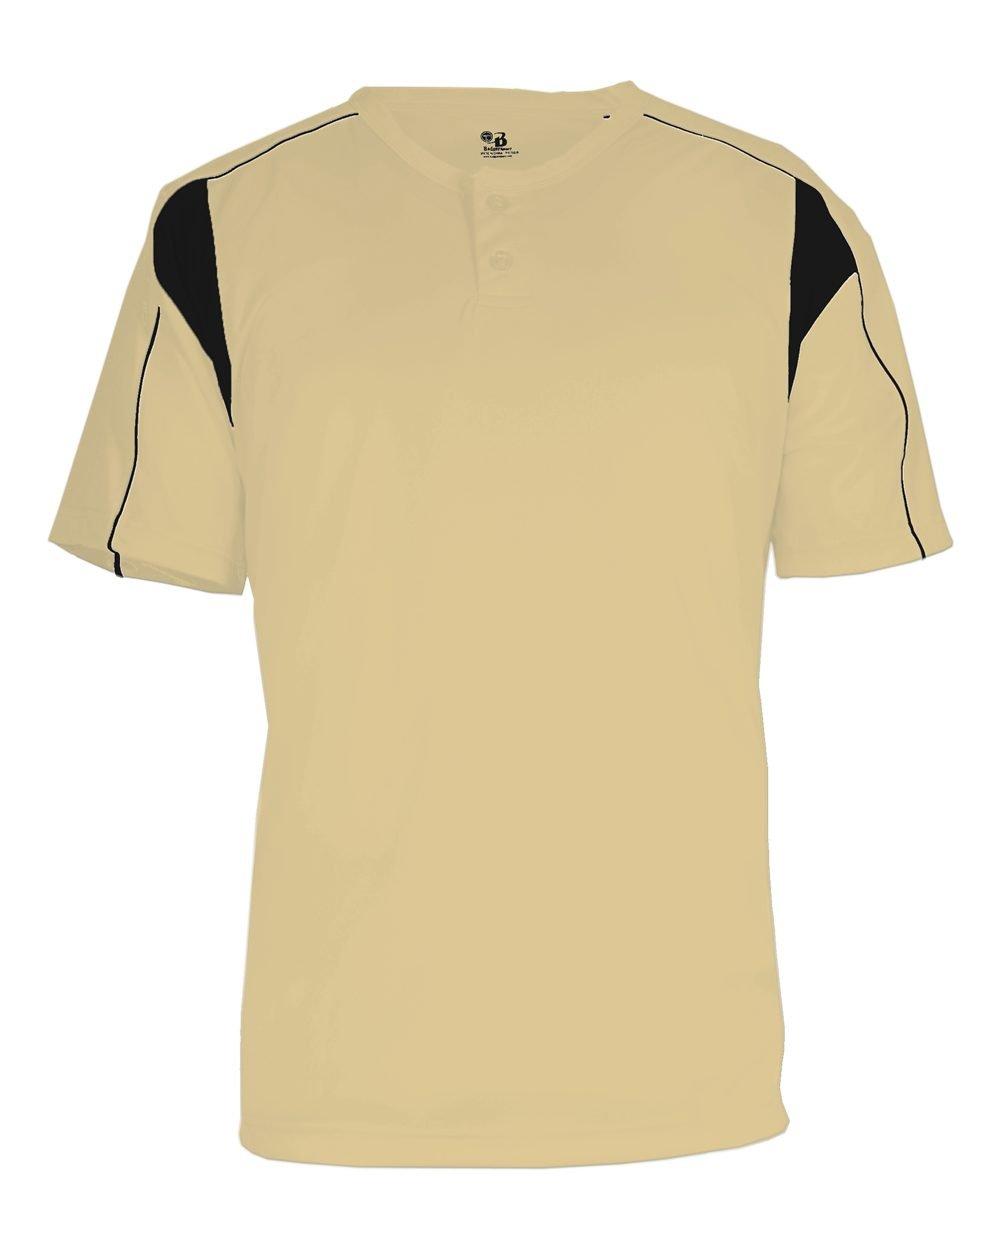 Badger 7937 BD Pro Plkt BSEBLL Tee B00E7NZMGI 5L|Vegas Gold/ Blk Vegas Gold/ Blk 5L